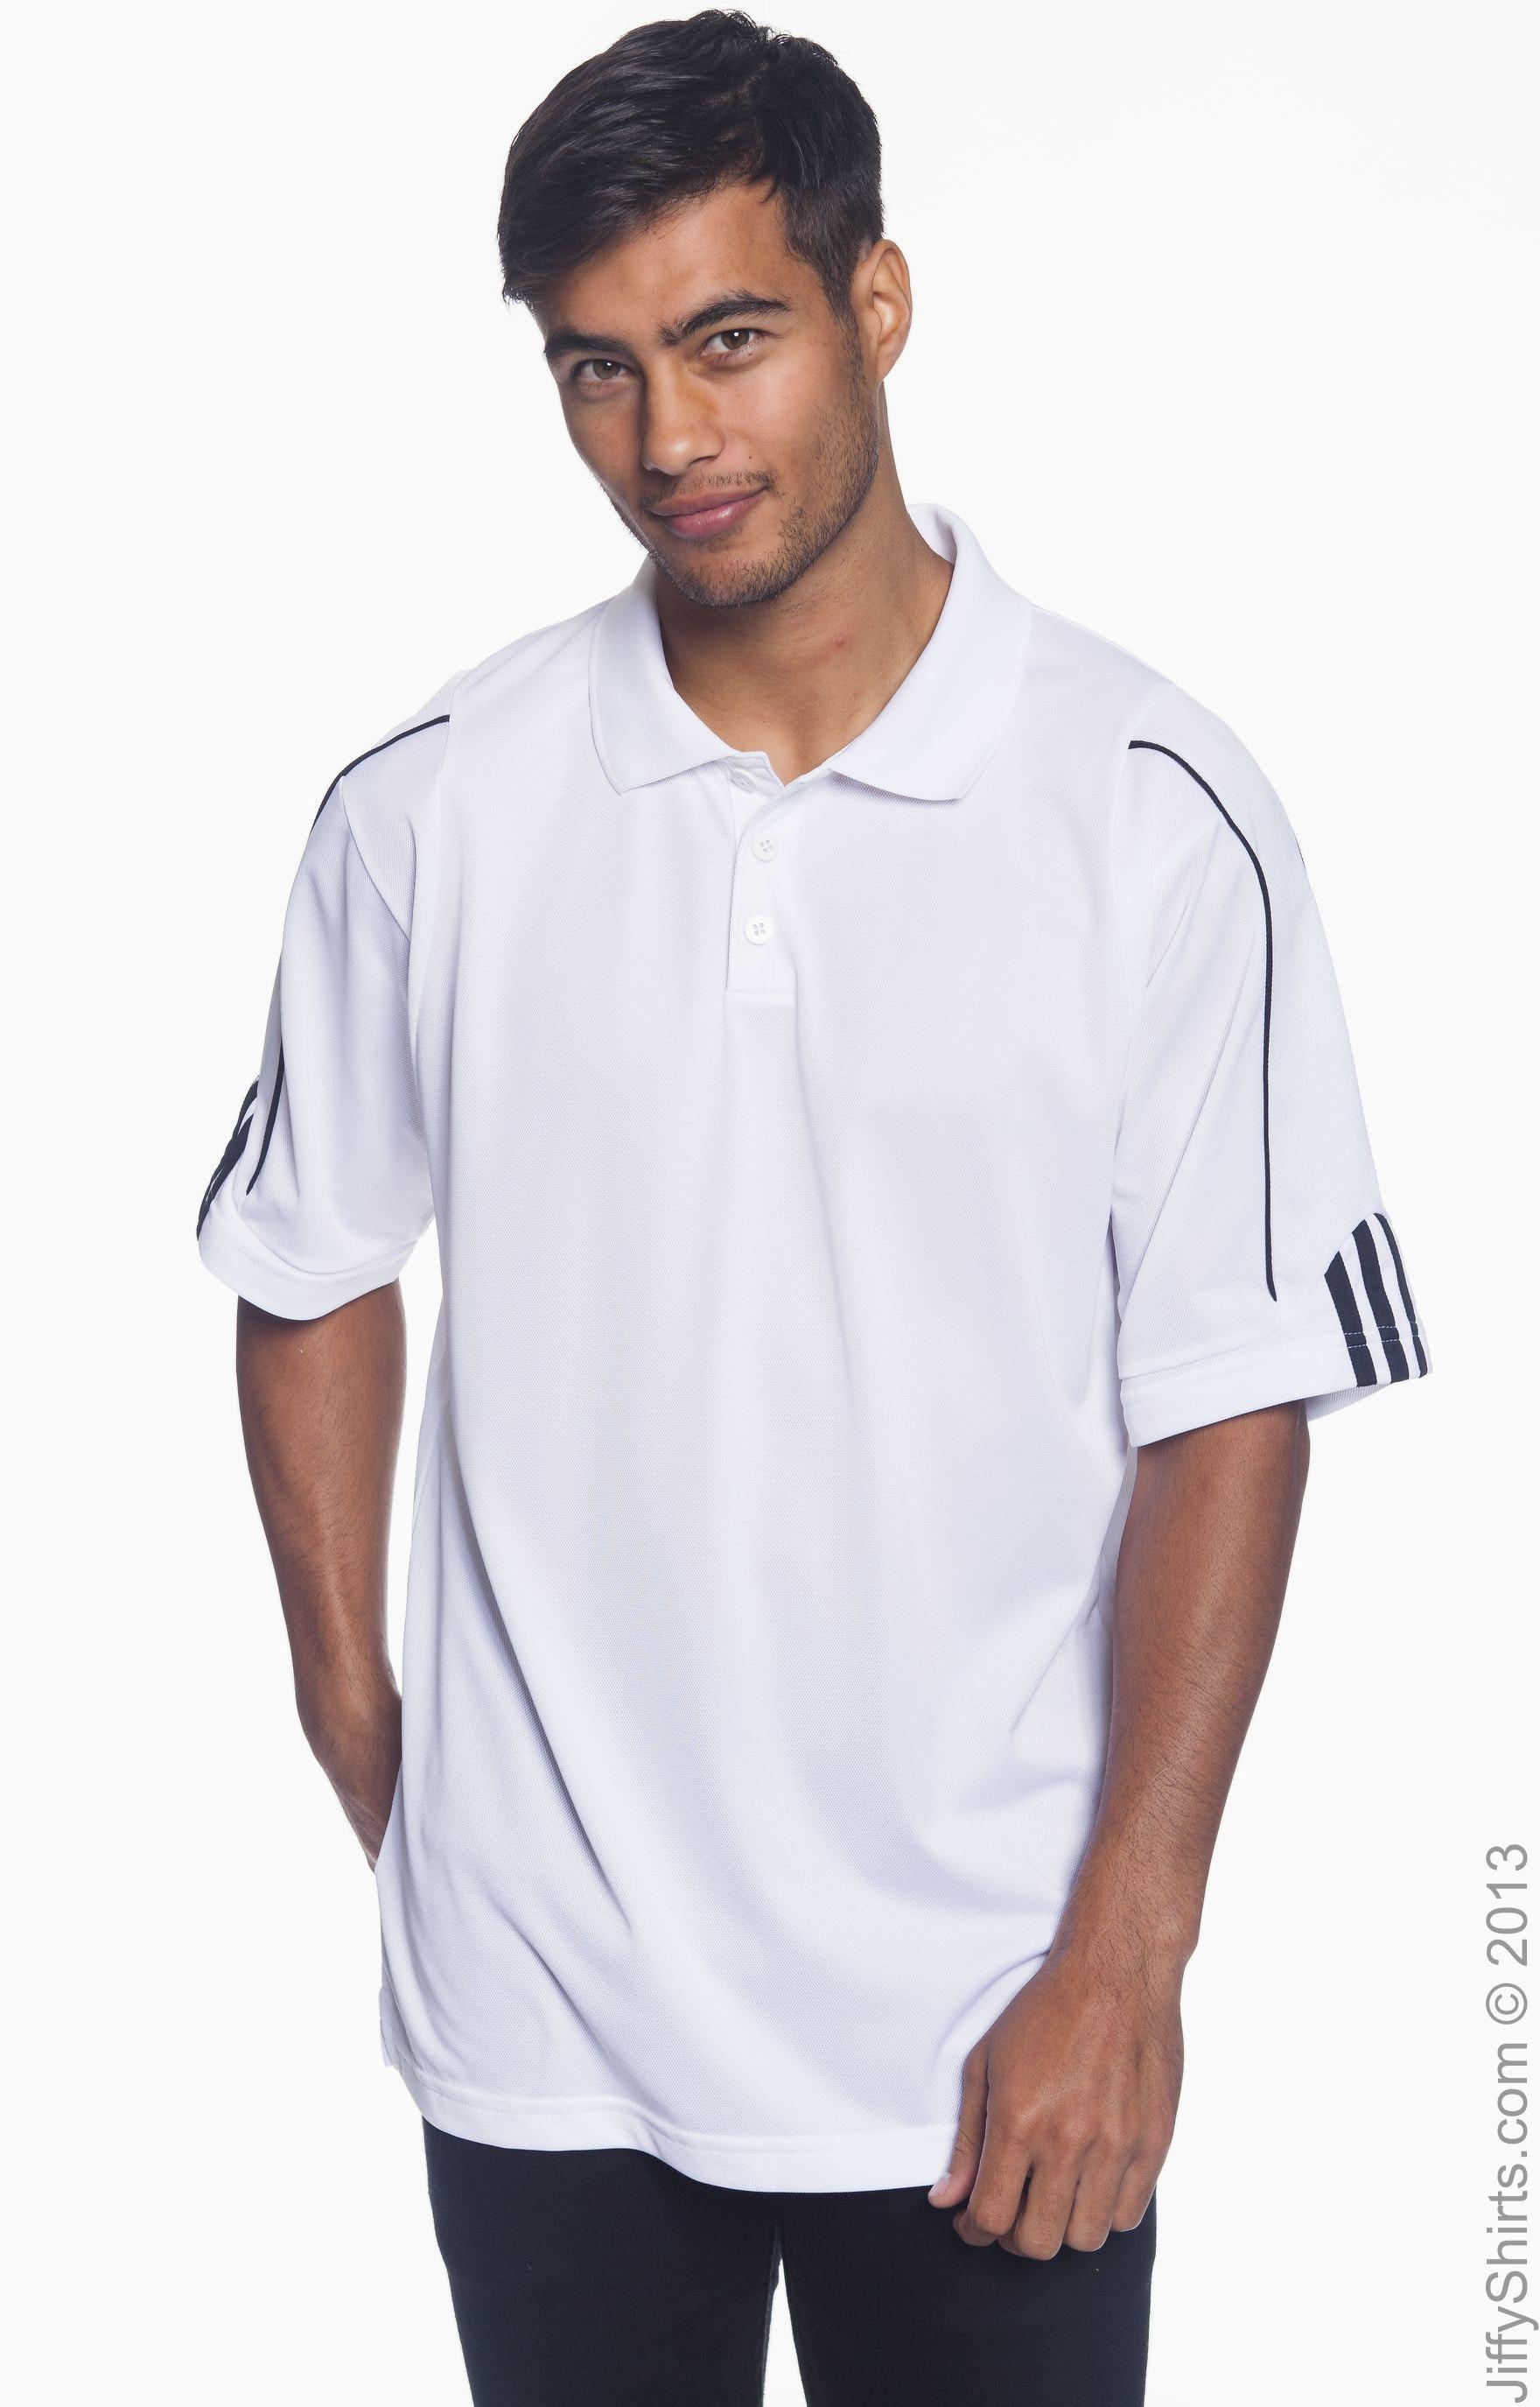 Adidas A76 White/Black